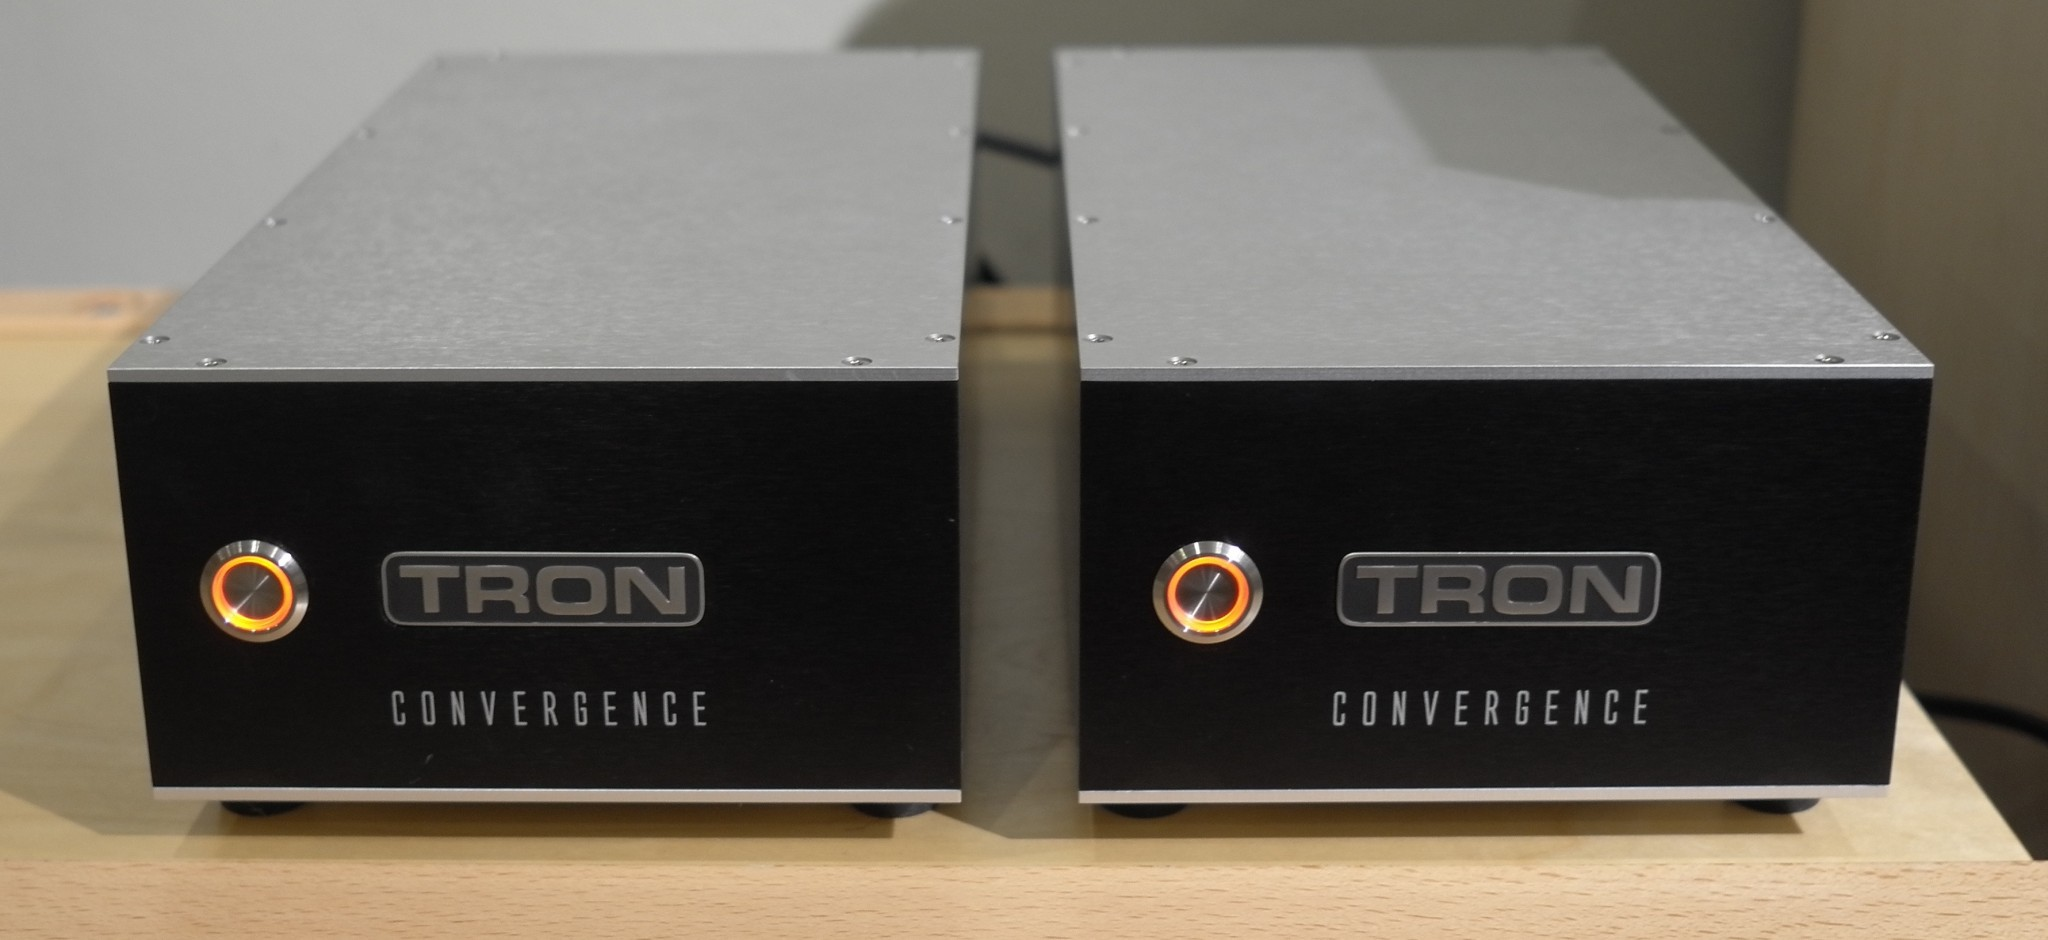 Convergence 50-watt Monoblock Amplifiers